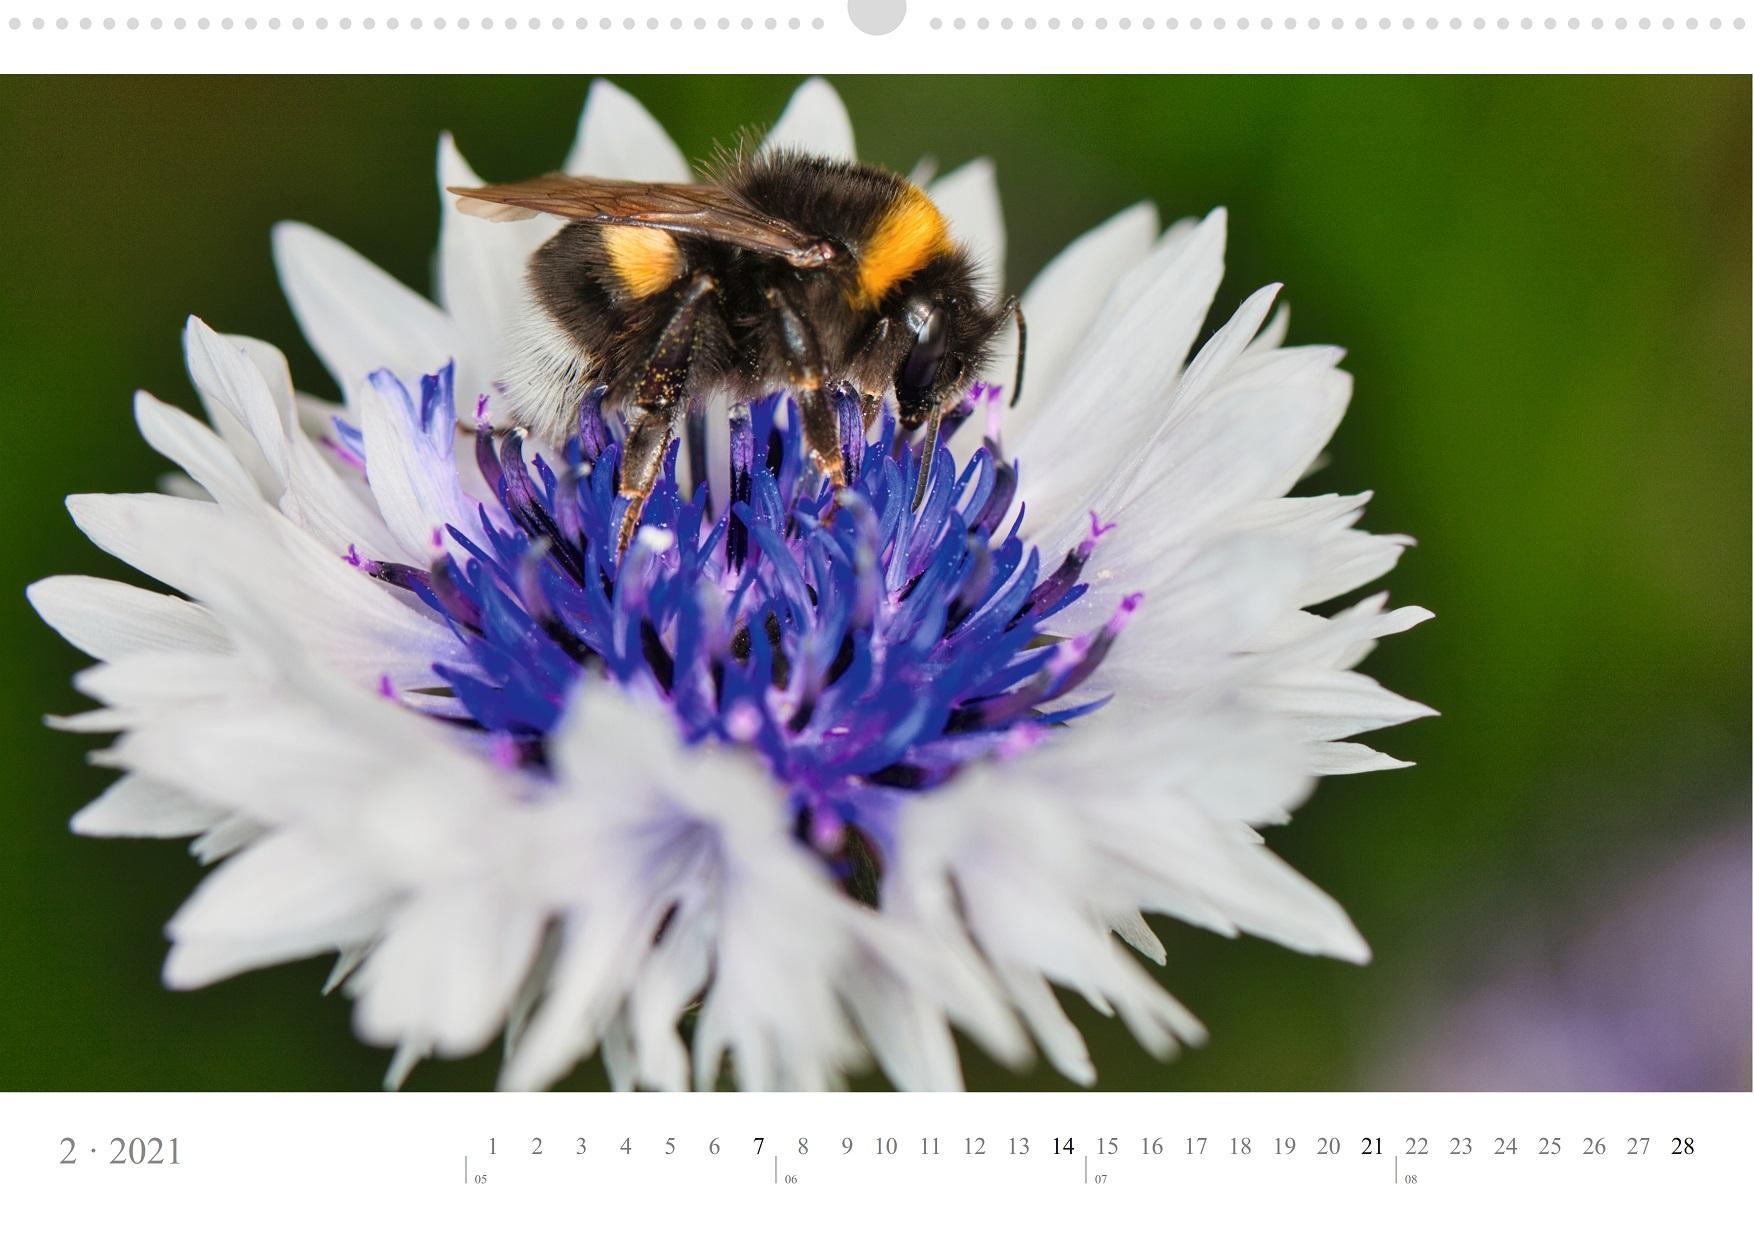 LCQ-Insekten-Kalender-2021-E1_002-1